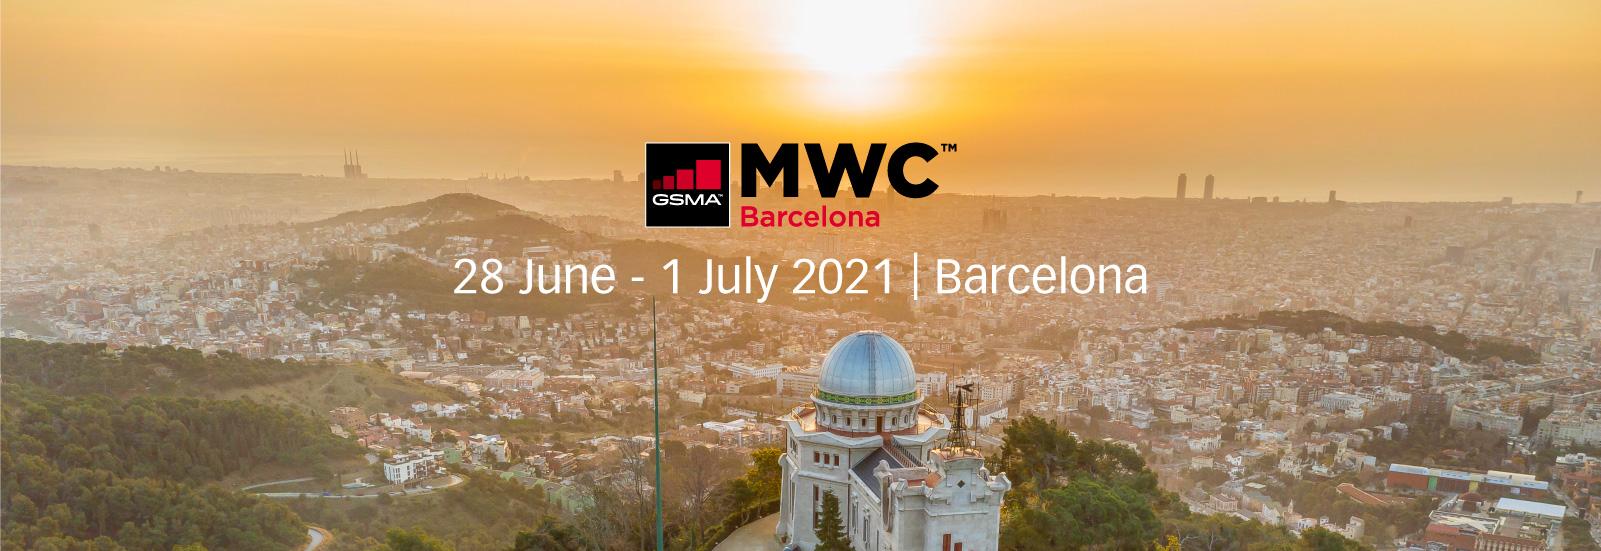 ProgressSoft將參加2021巴塞羅那MWC展